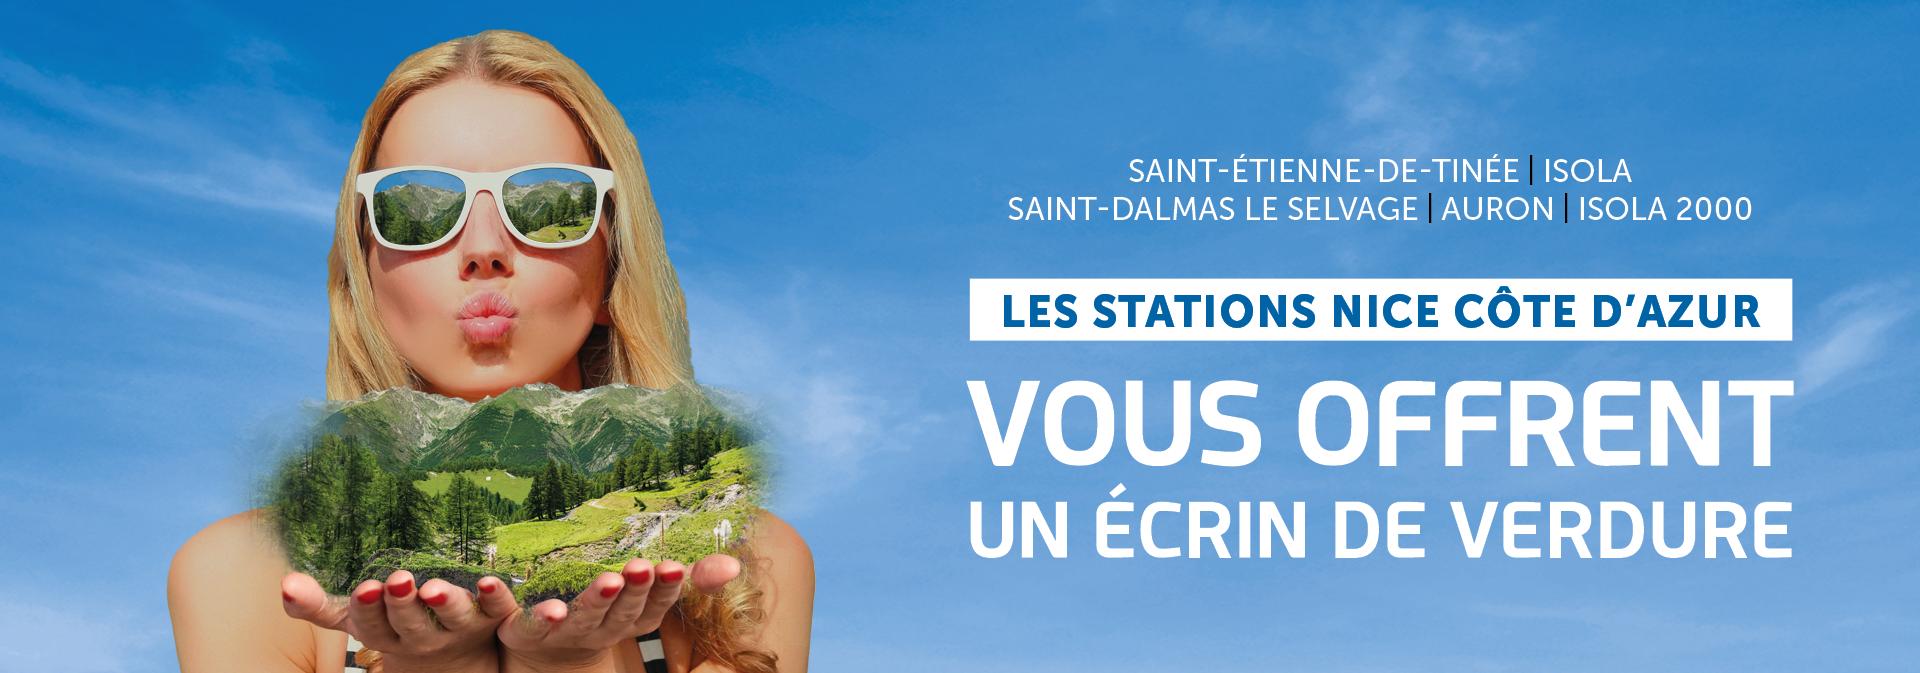 BandeauSitedesStations_NCA-ETEr2021_1920x673